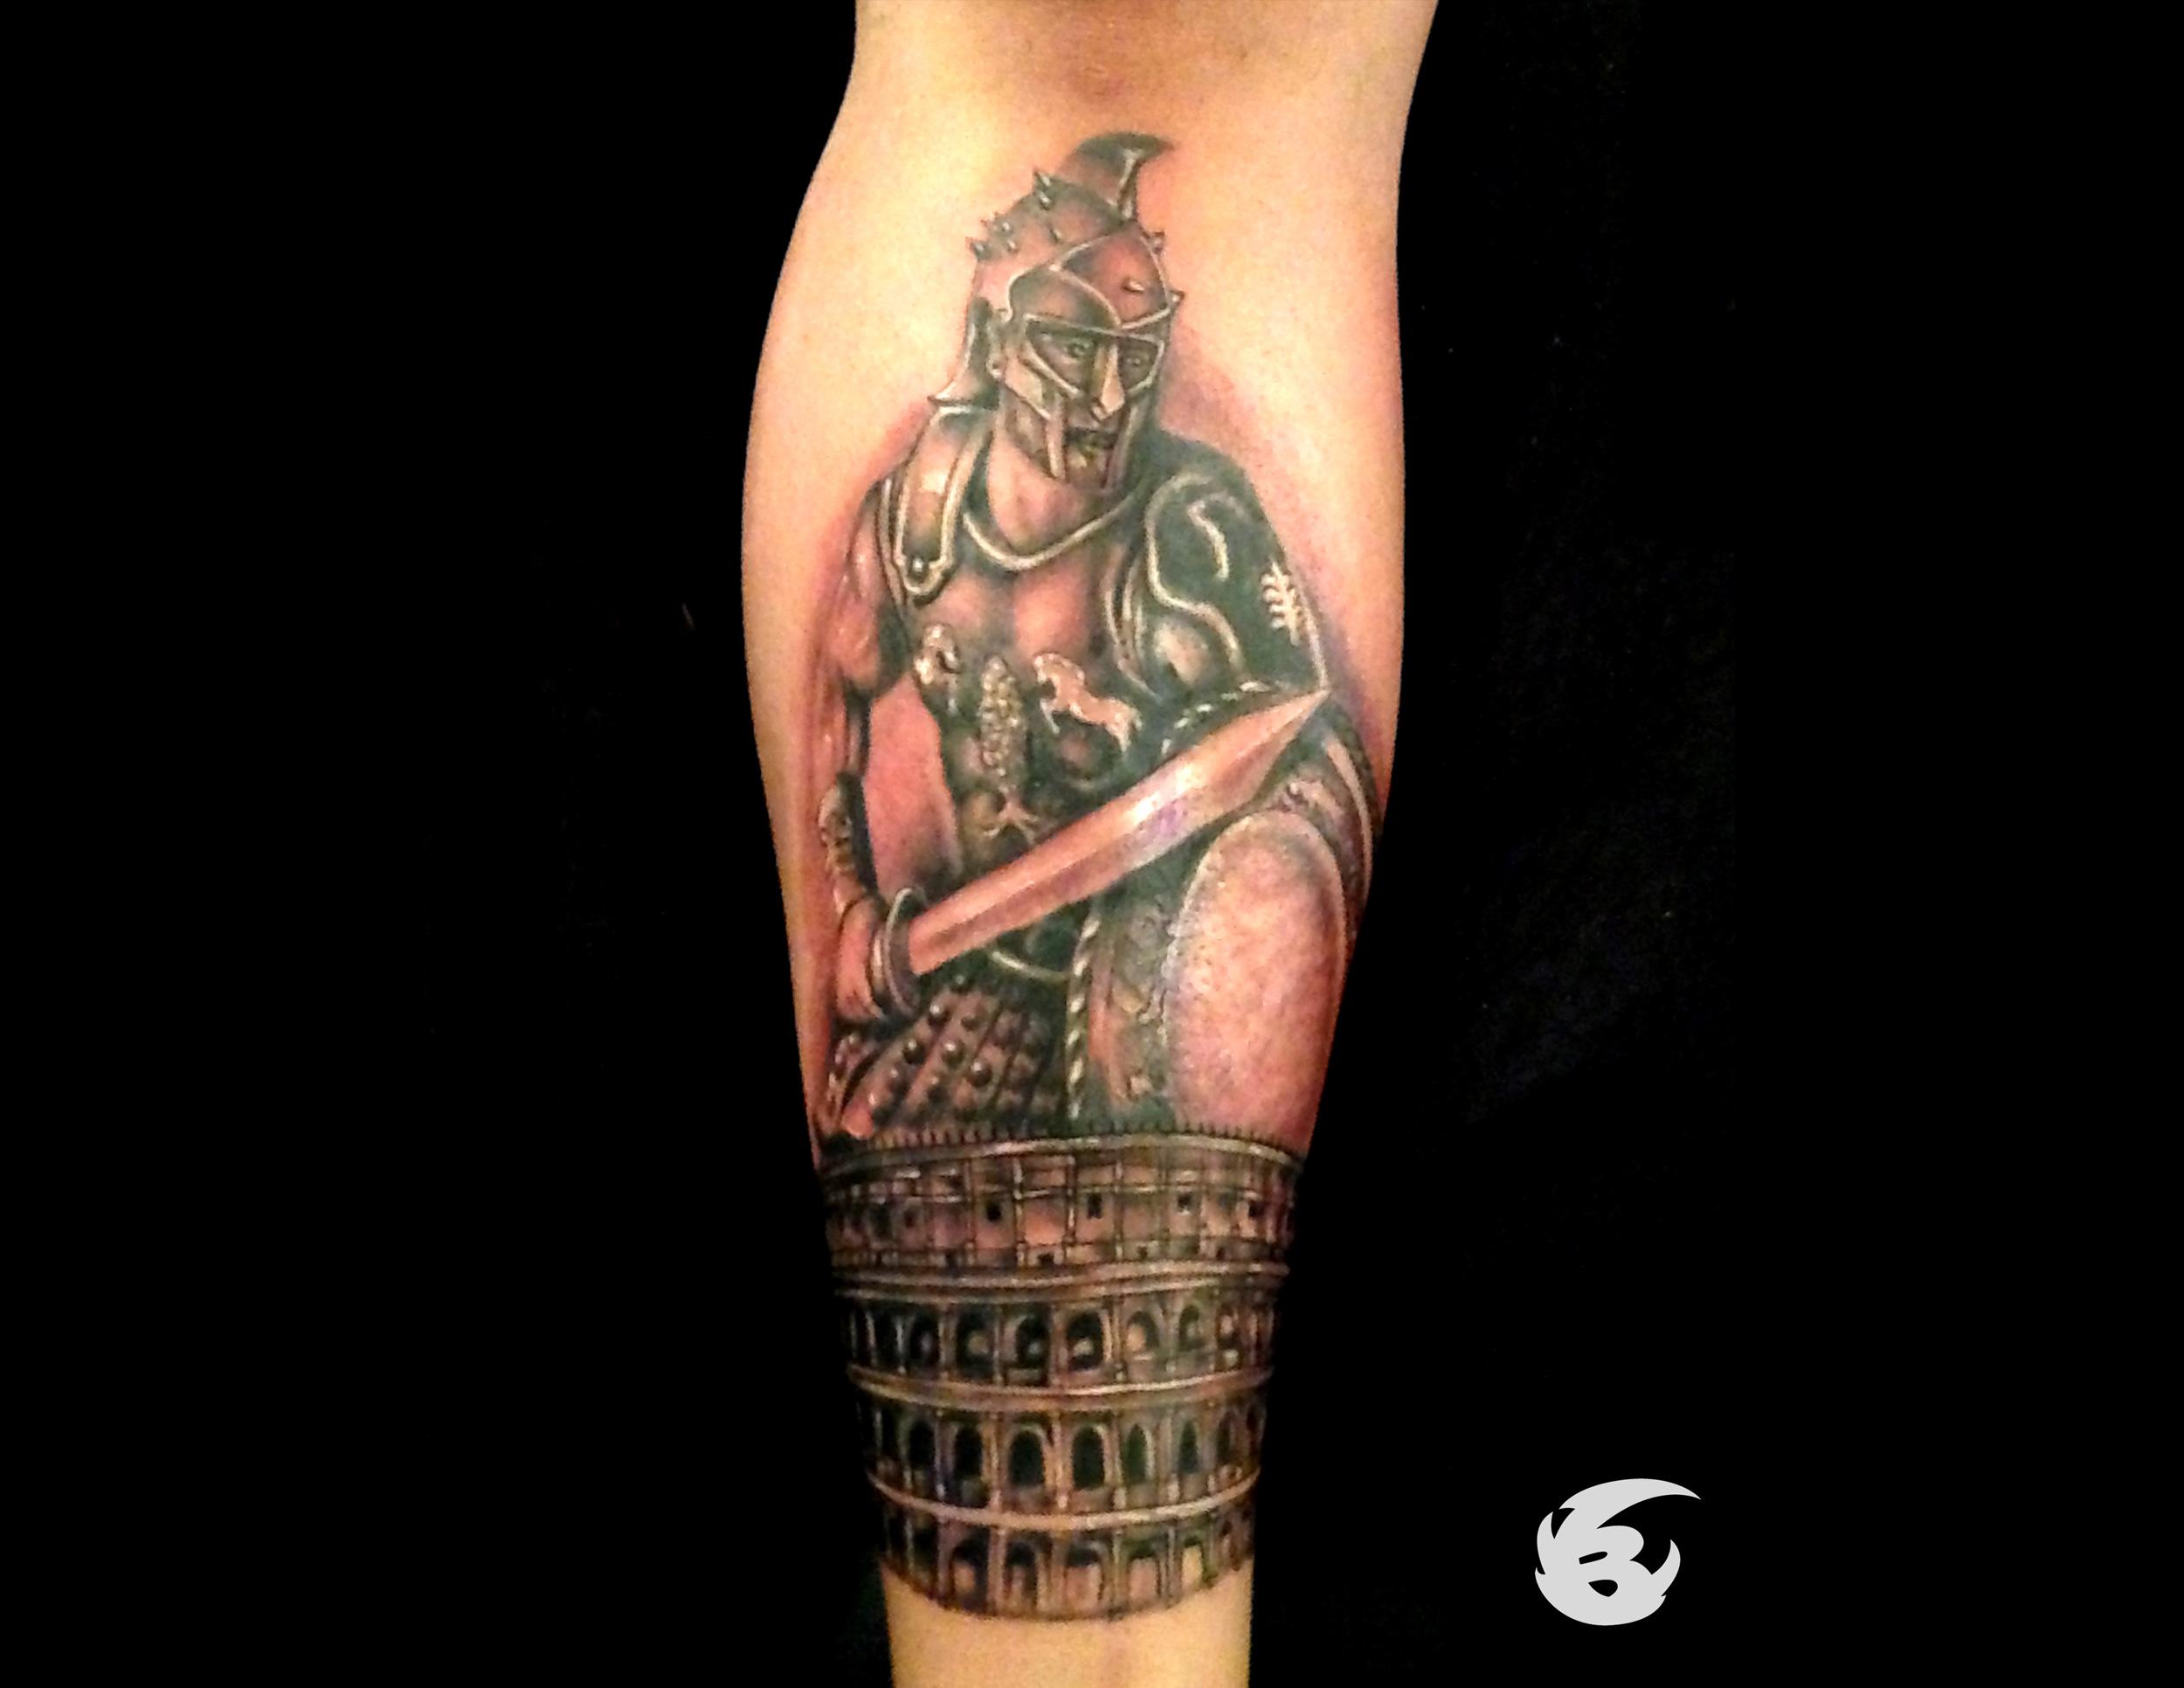 Badder Gladiator